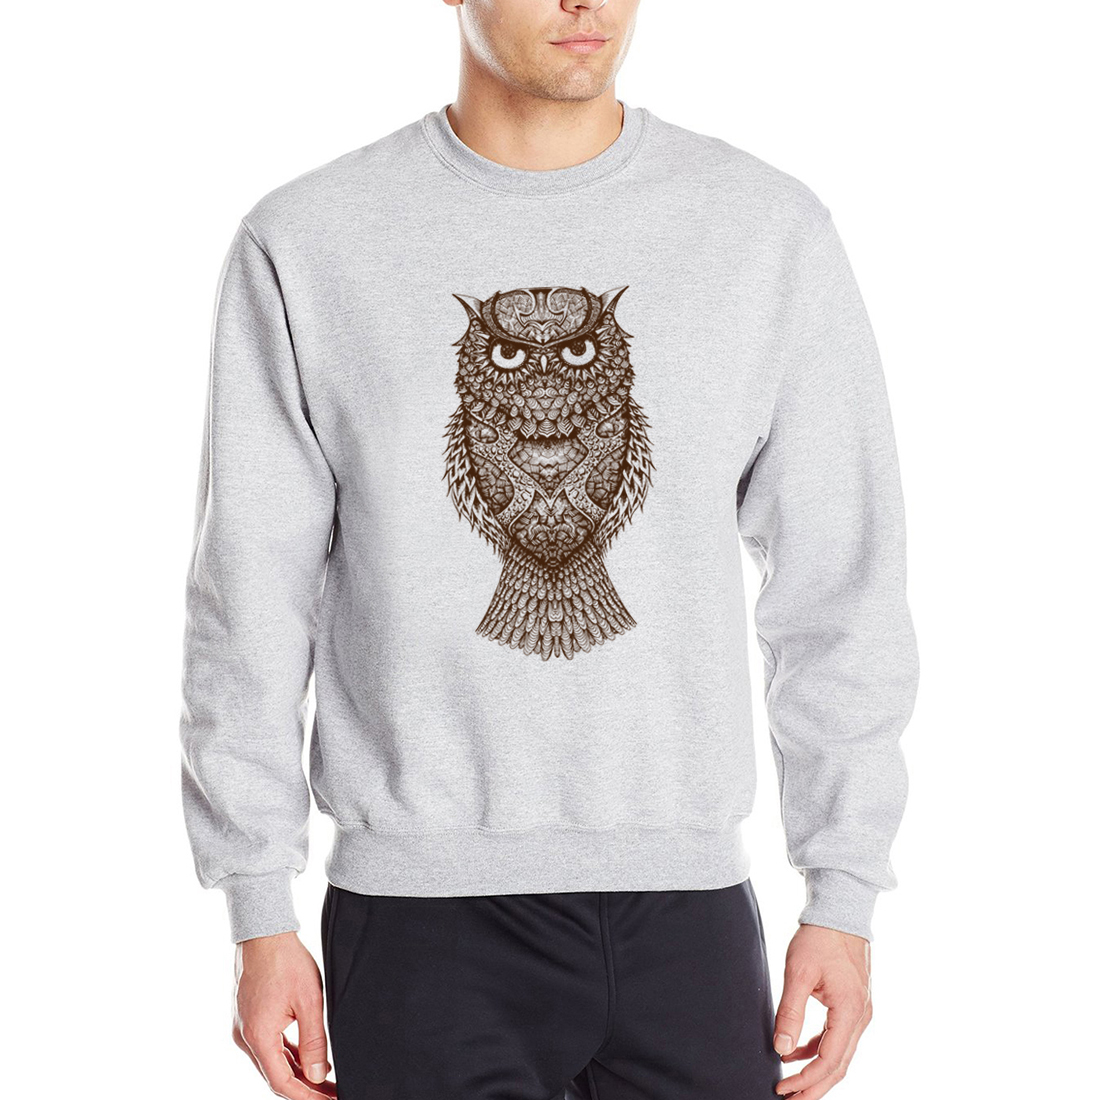 Animal Owl Printed Men Sweatshirts Hoodies 2019 New Spring Autumn For Male Hip Hop Sweatshirt Fleece Casual Men's Hooded CM01